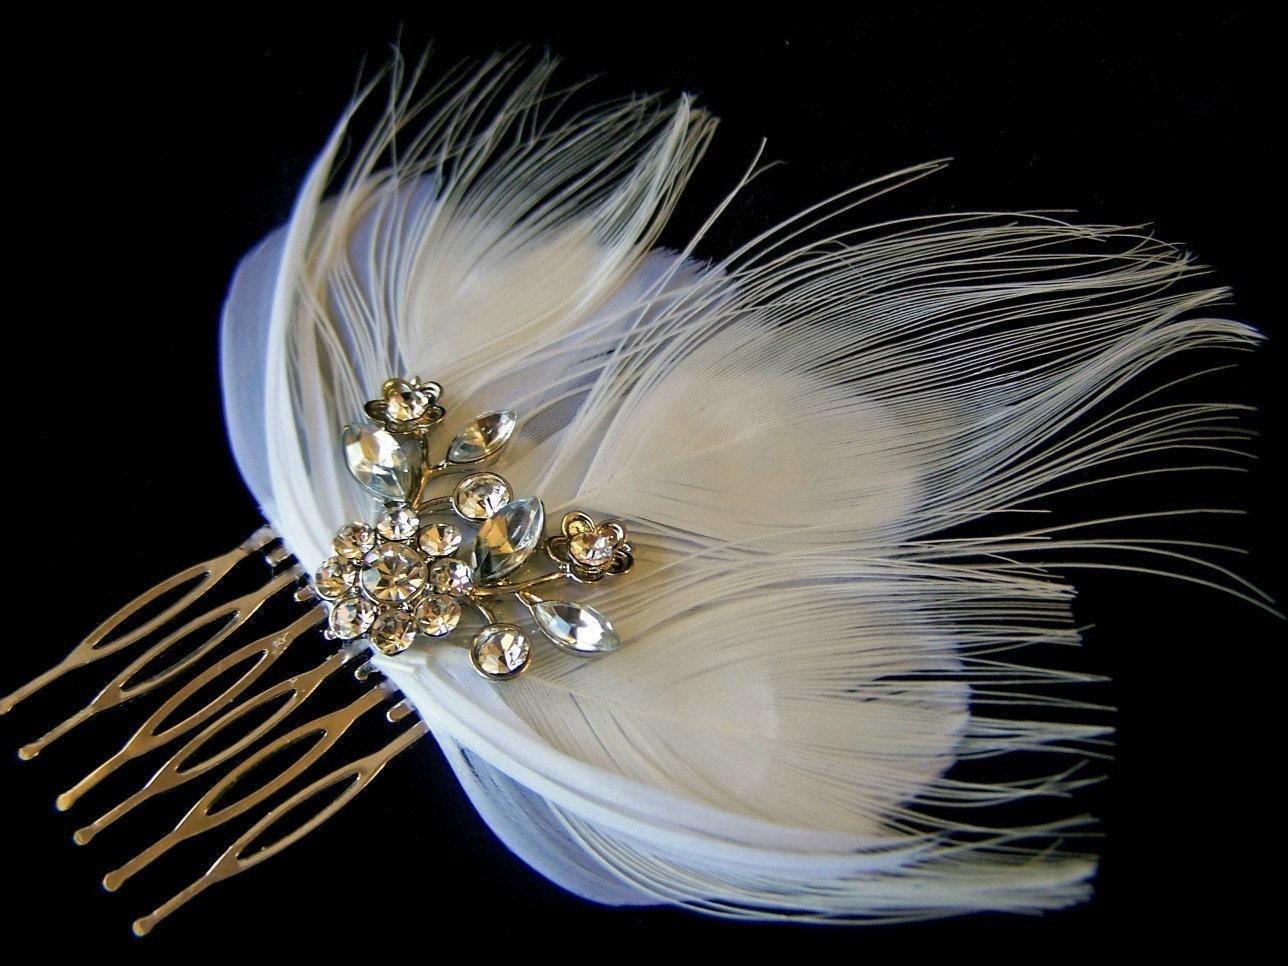 White peacock feather